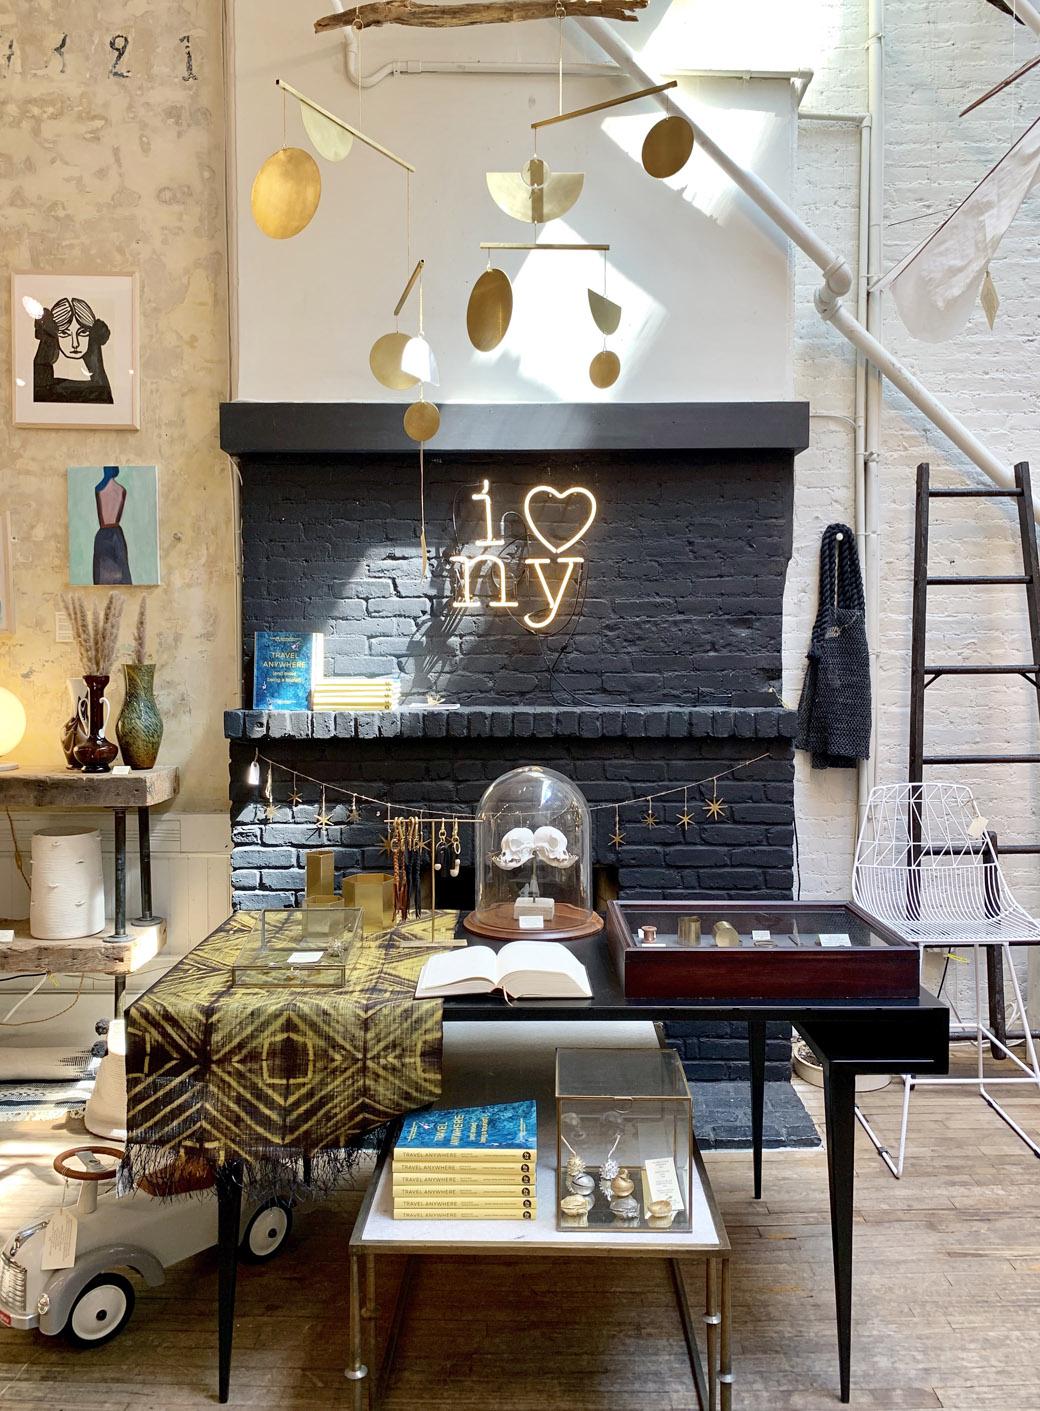 Michelle Varian Shop Tour New York City on decor8